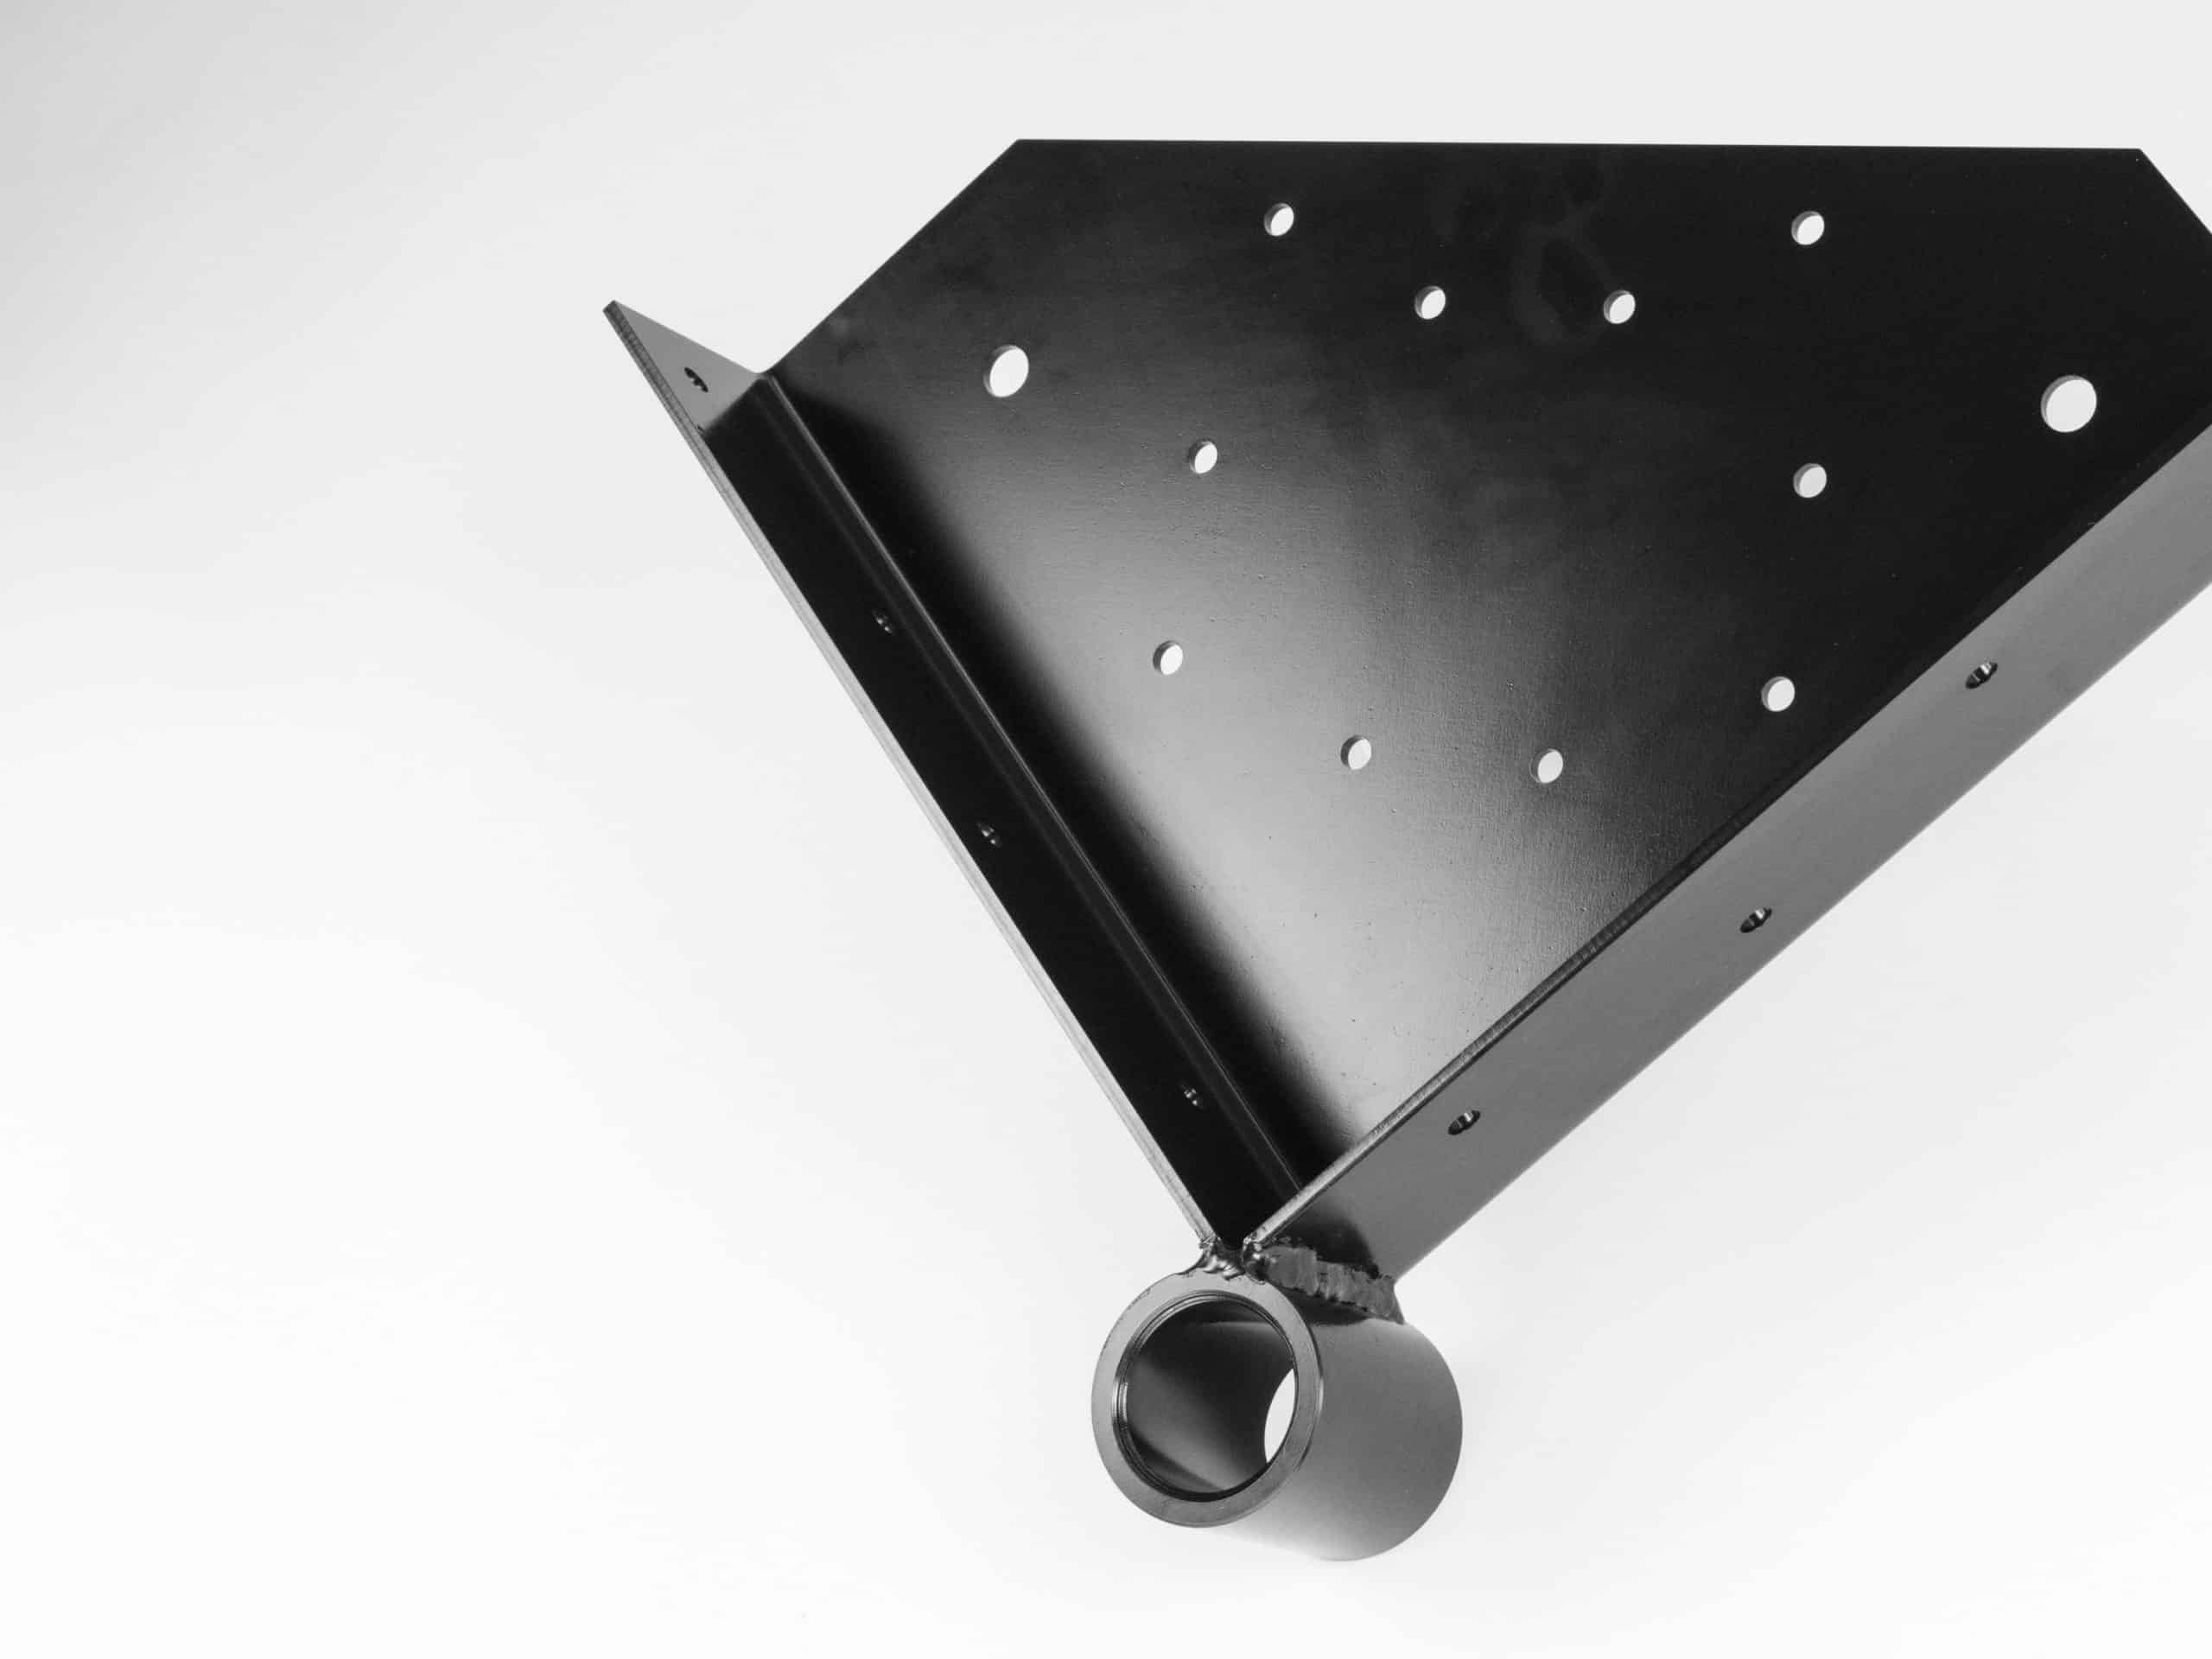 45°-diamond-bracket-front-treehouse-technology